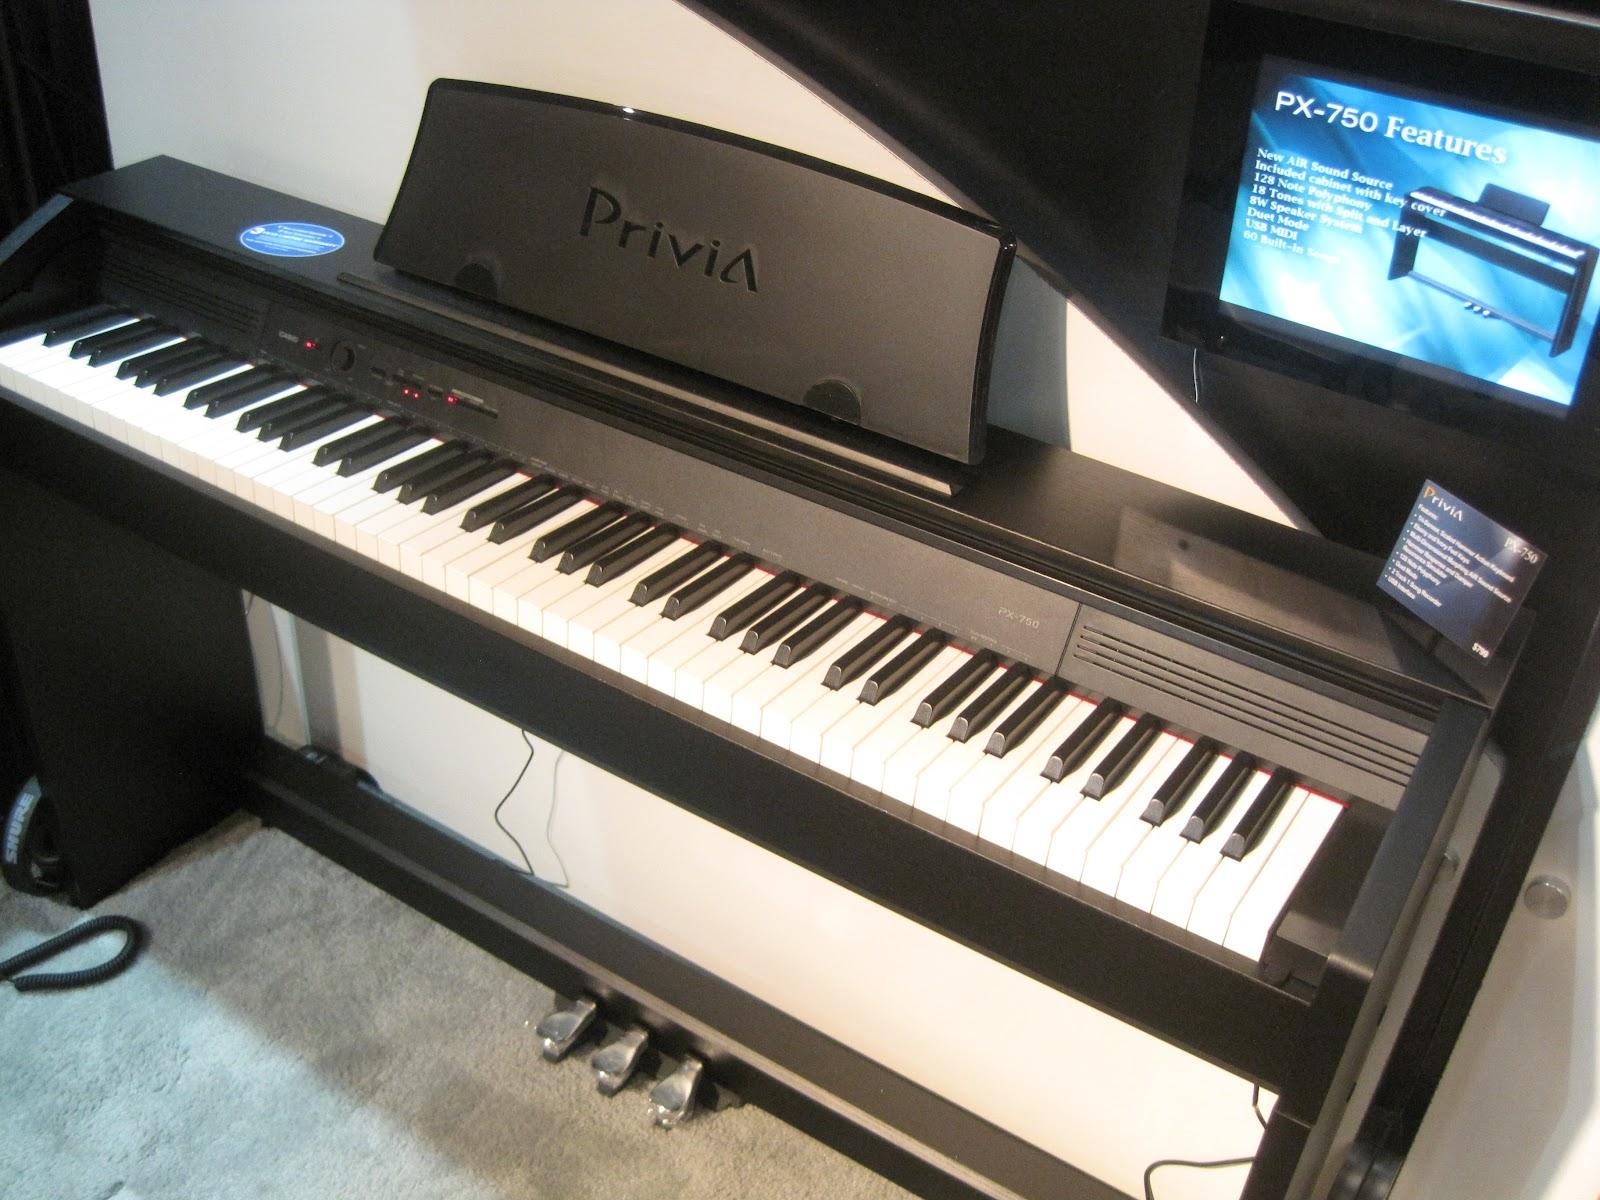 az piano reviews review best beginner digital pianos. Black Bedroom Furniture Sets. Home Design Ideas